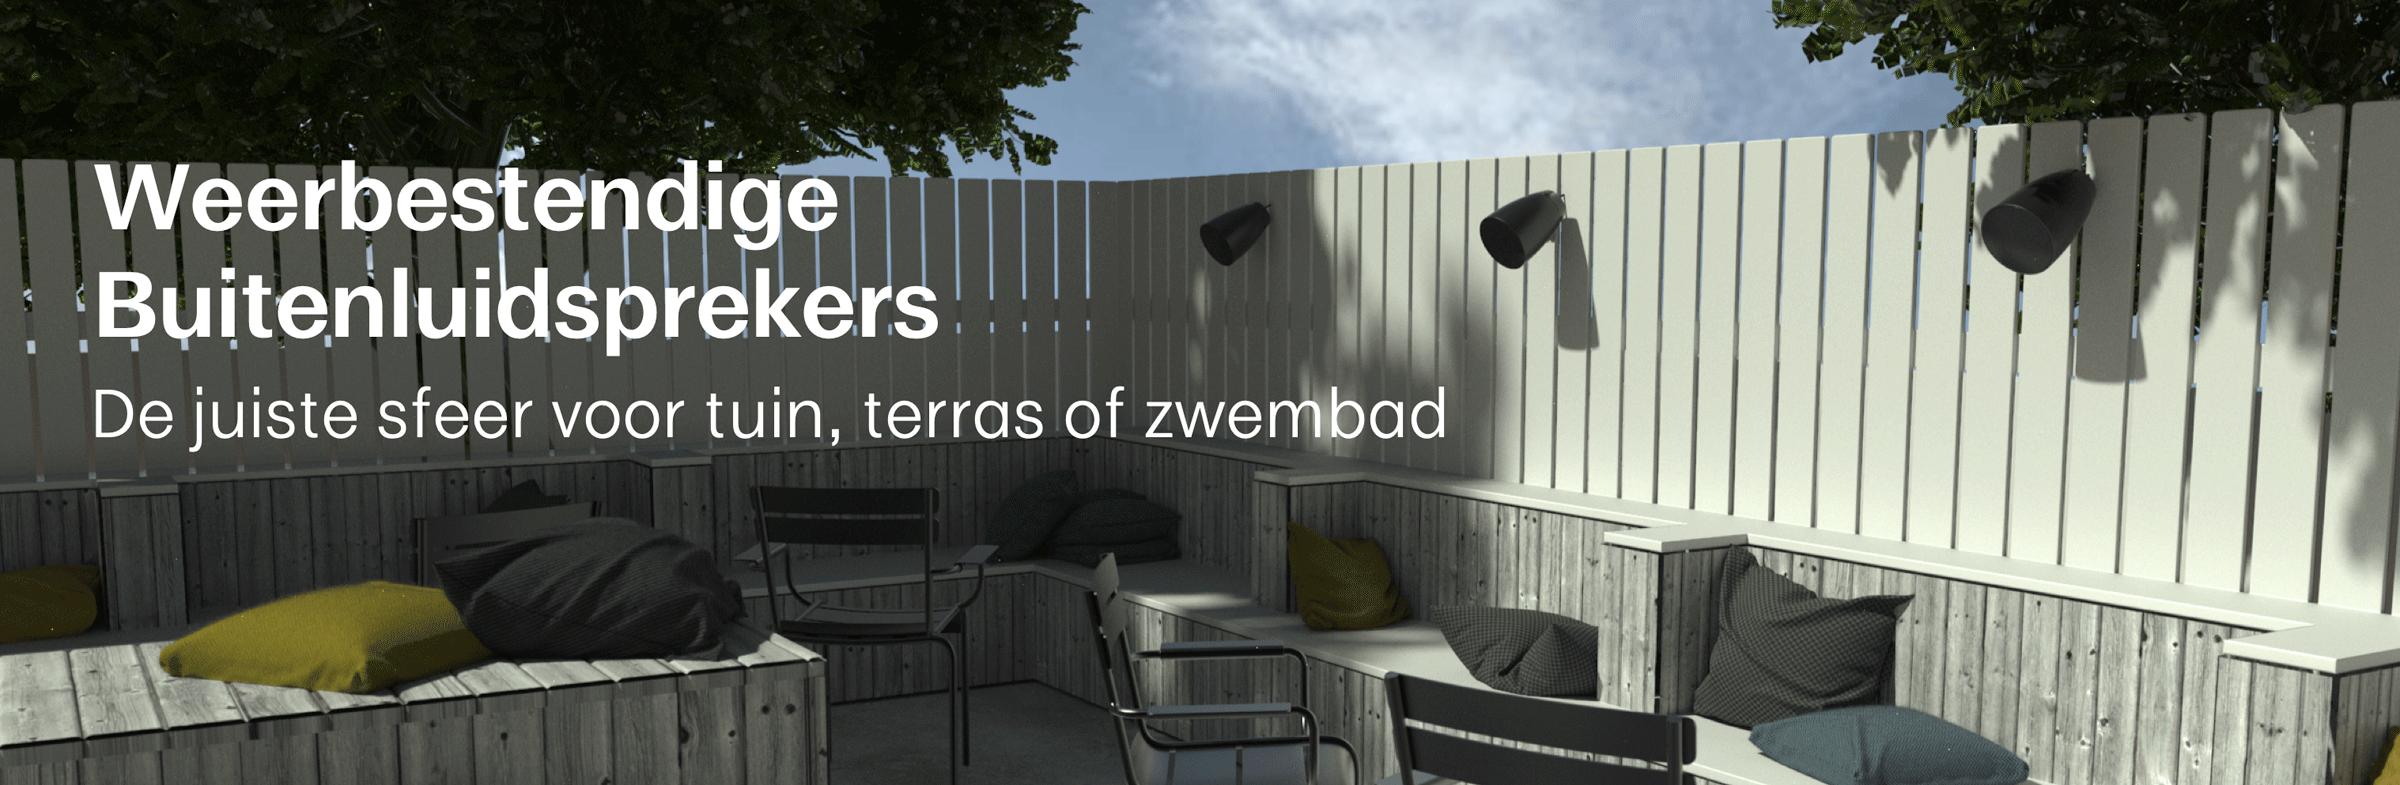 weerbestendige en outdoor luidsprekers